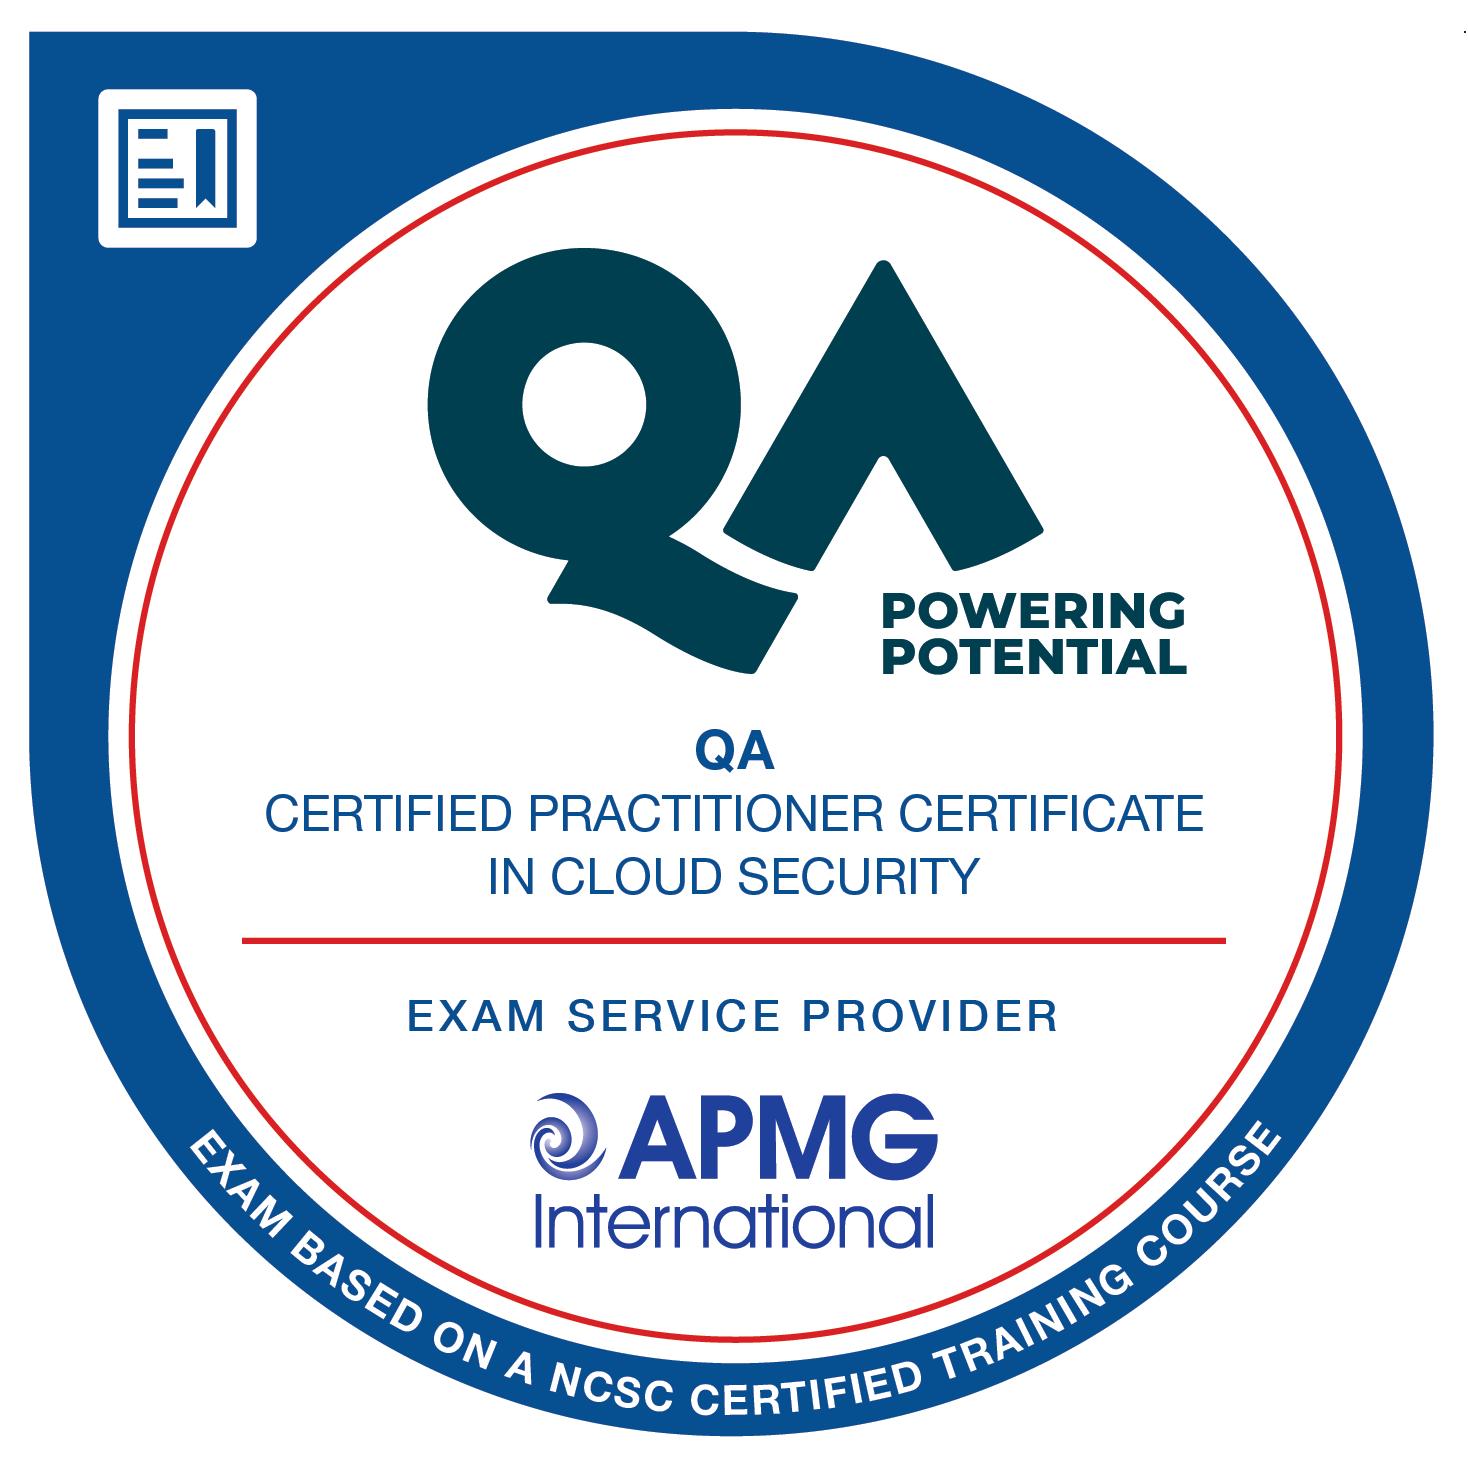 QA Certified Practitioner Certificate in Cloud Security